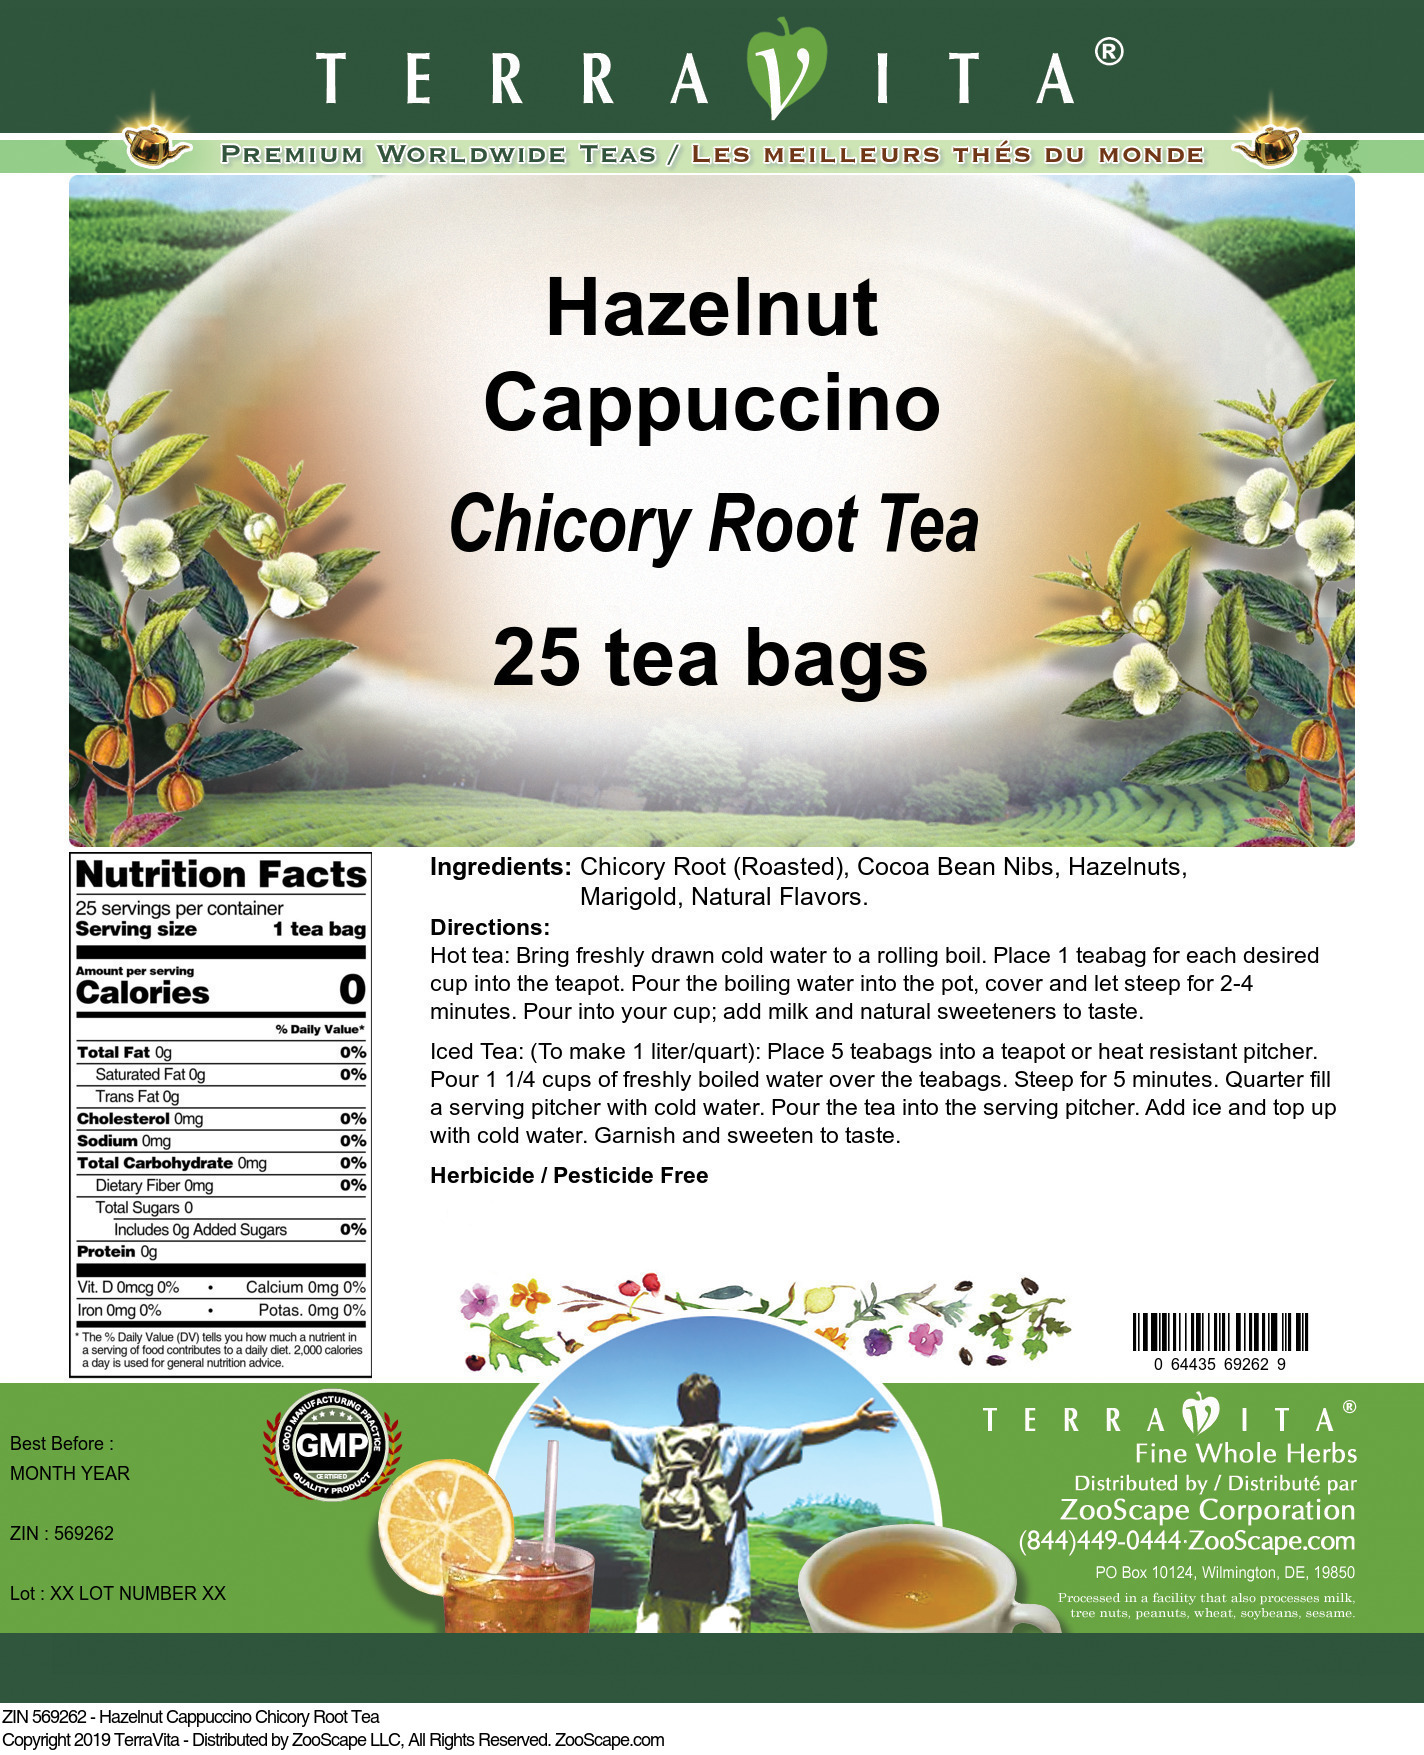 Hazelnut Cappuccino Chicory Root